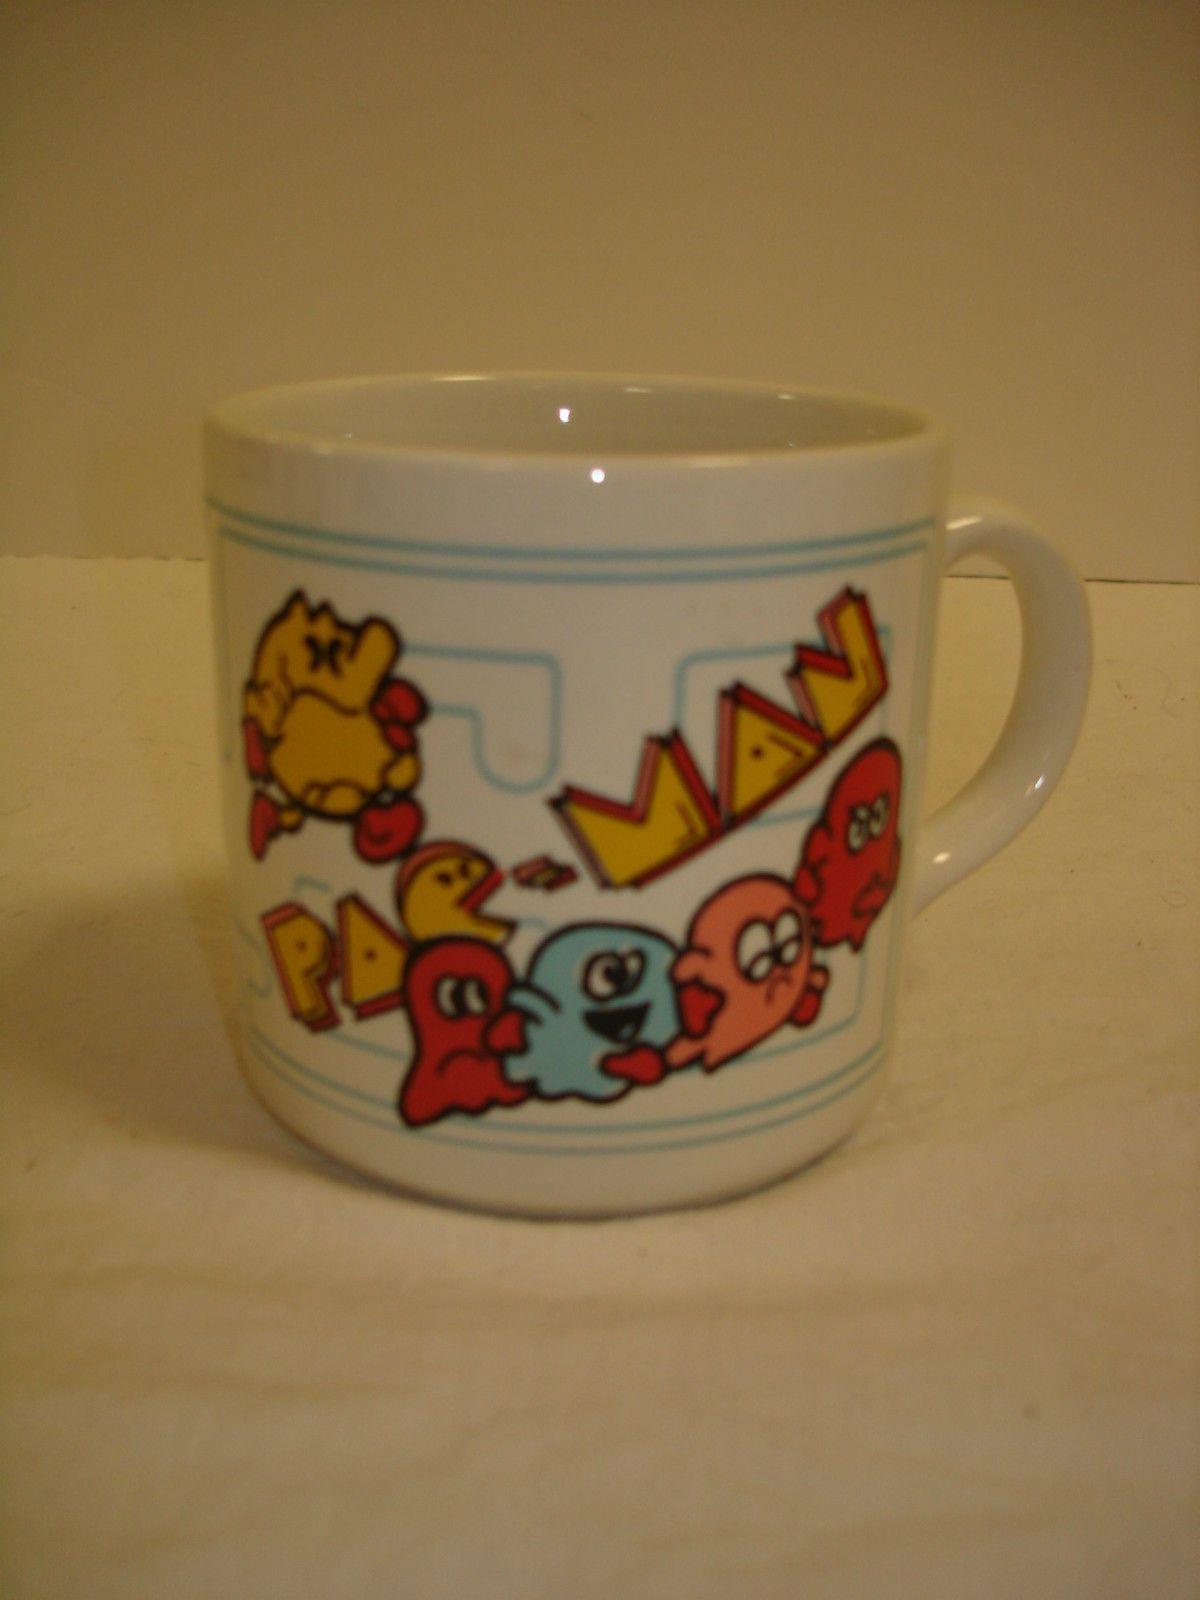 Pacman Vintage Video Game Coffee Mug Ad Figure Pac Man